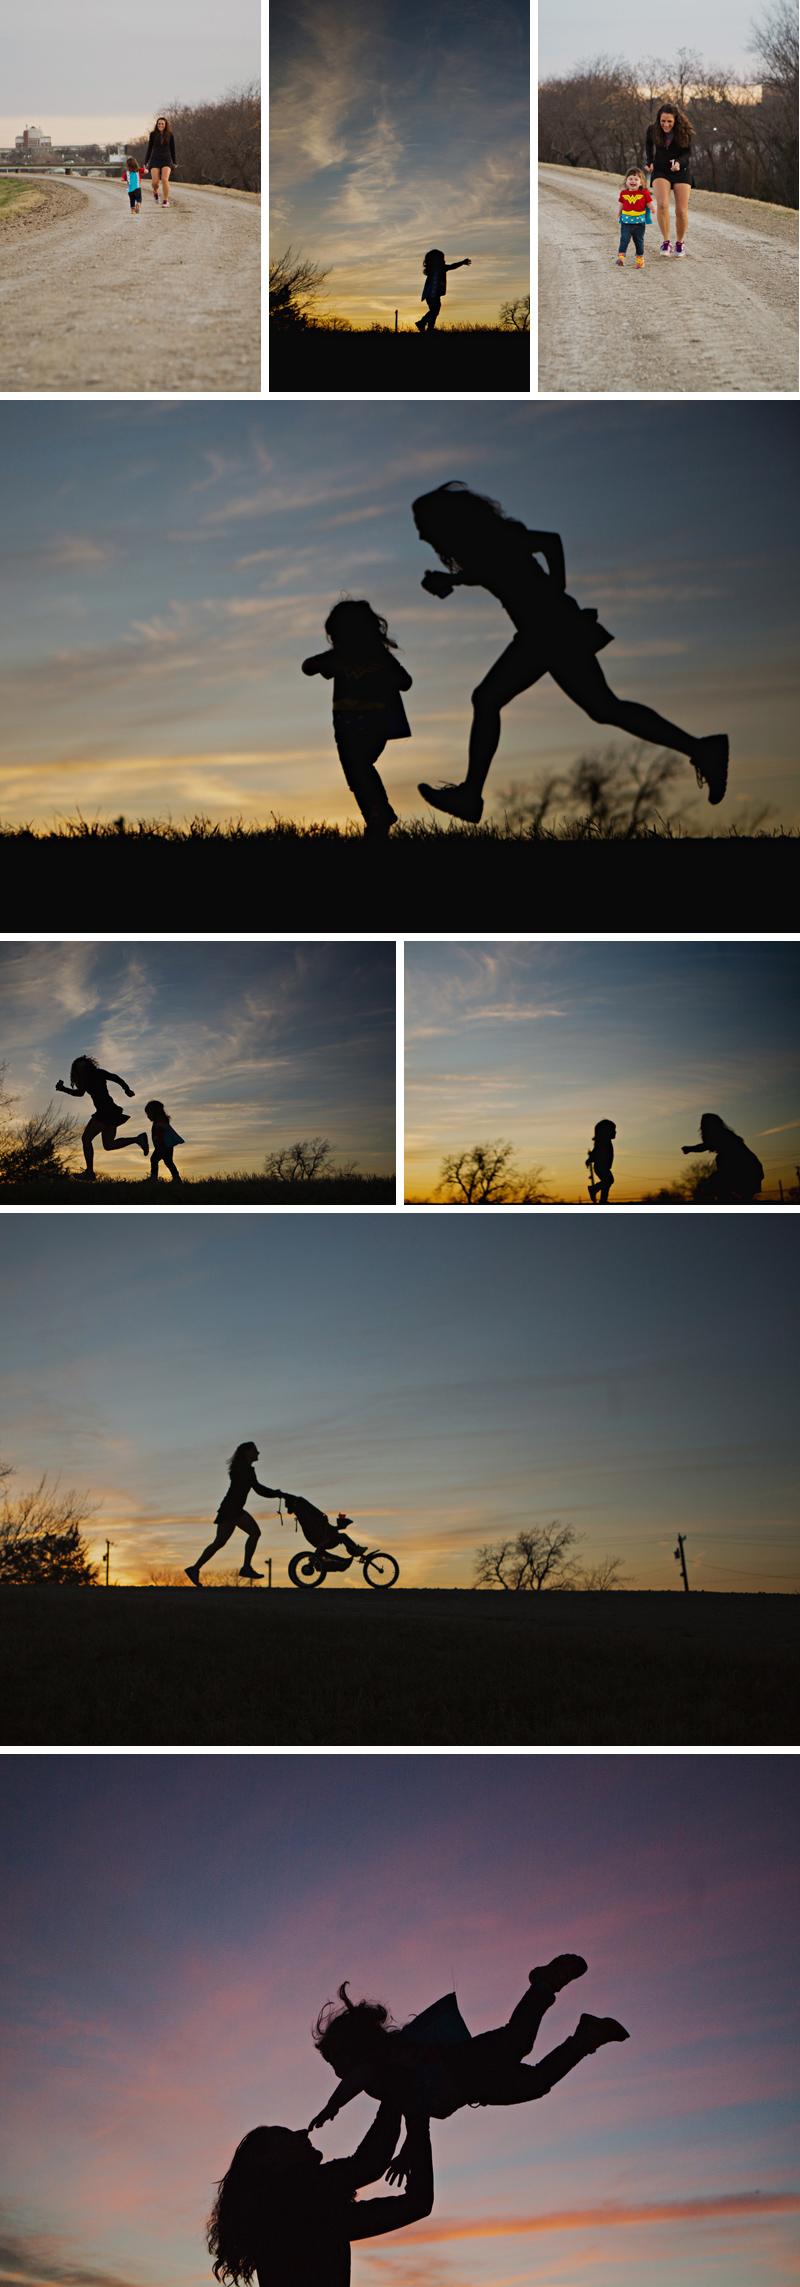 Dallas-Family-Photographerc012